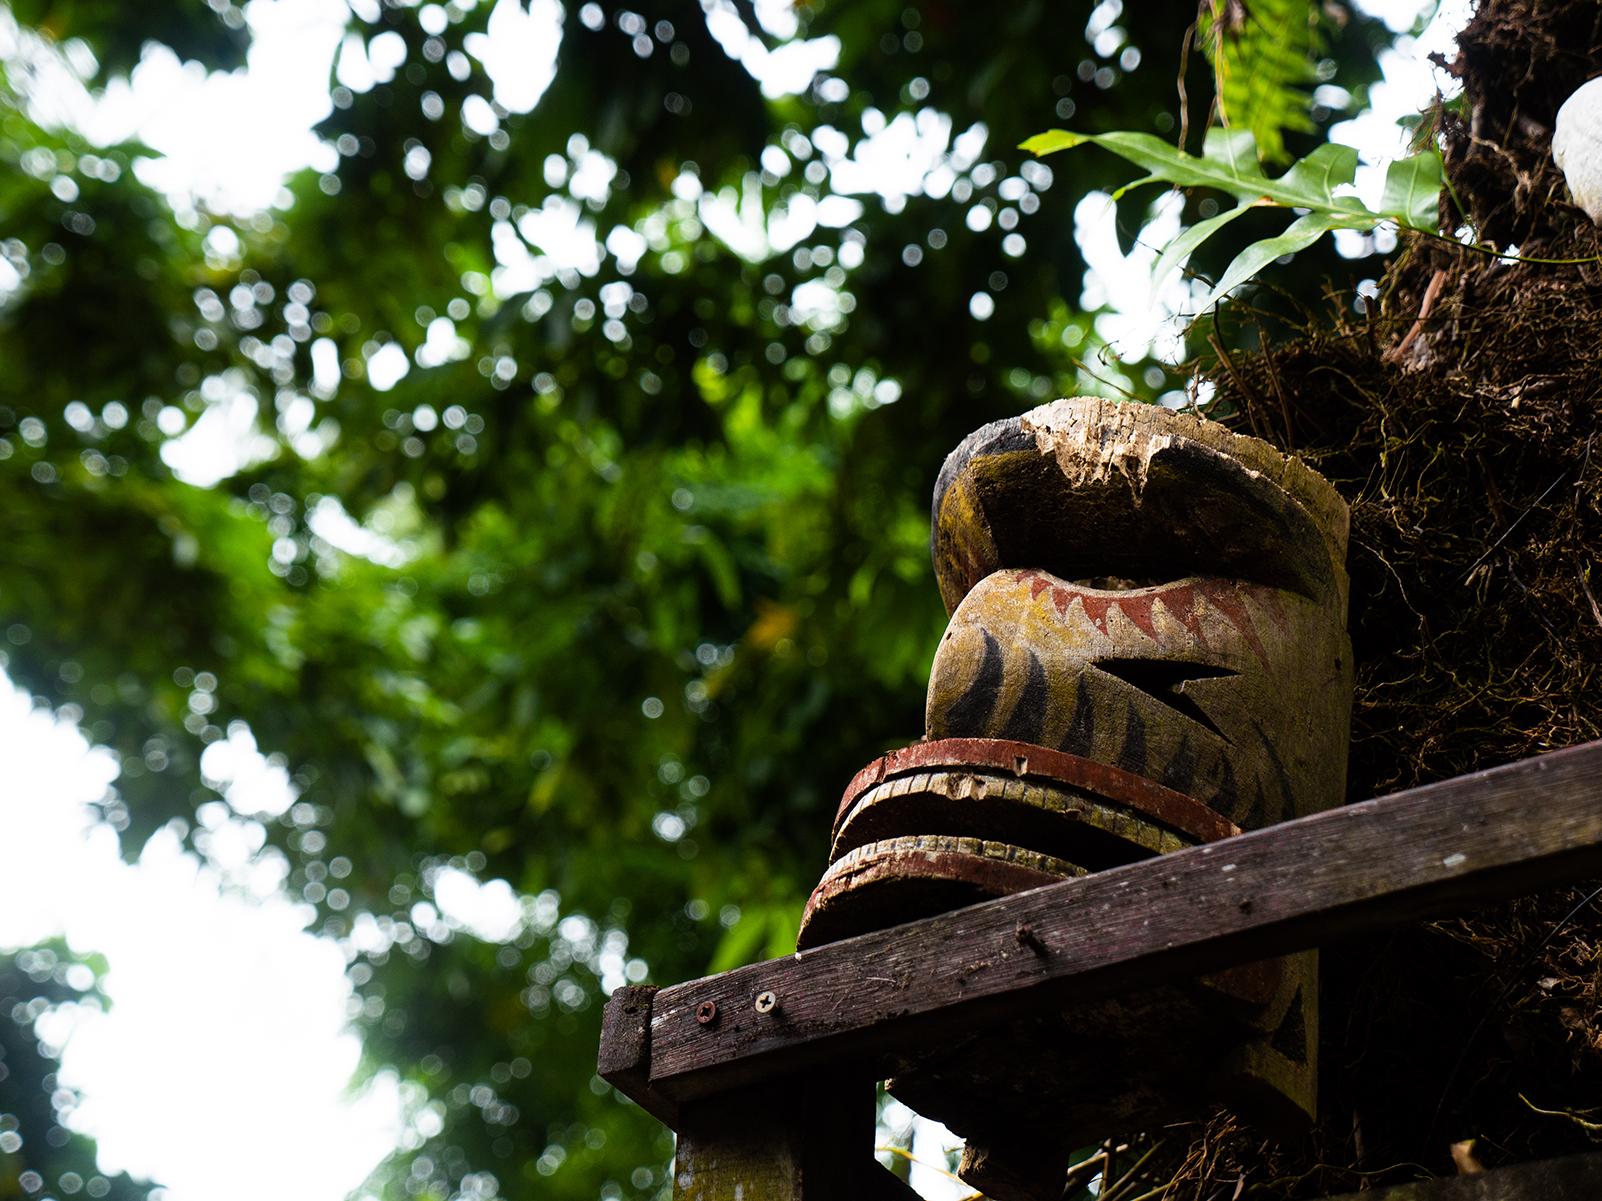 No two the same - Papua New Guinea has more than 800 distinct language groups.